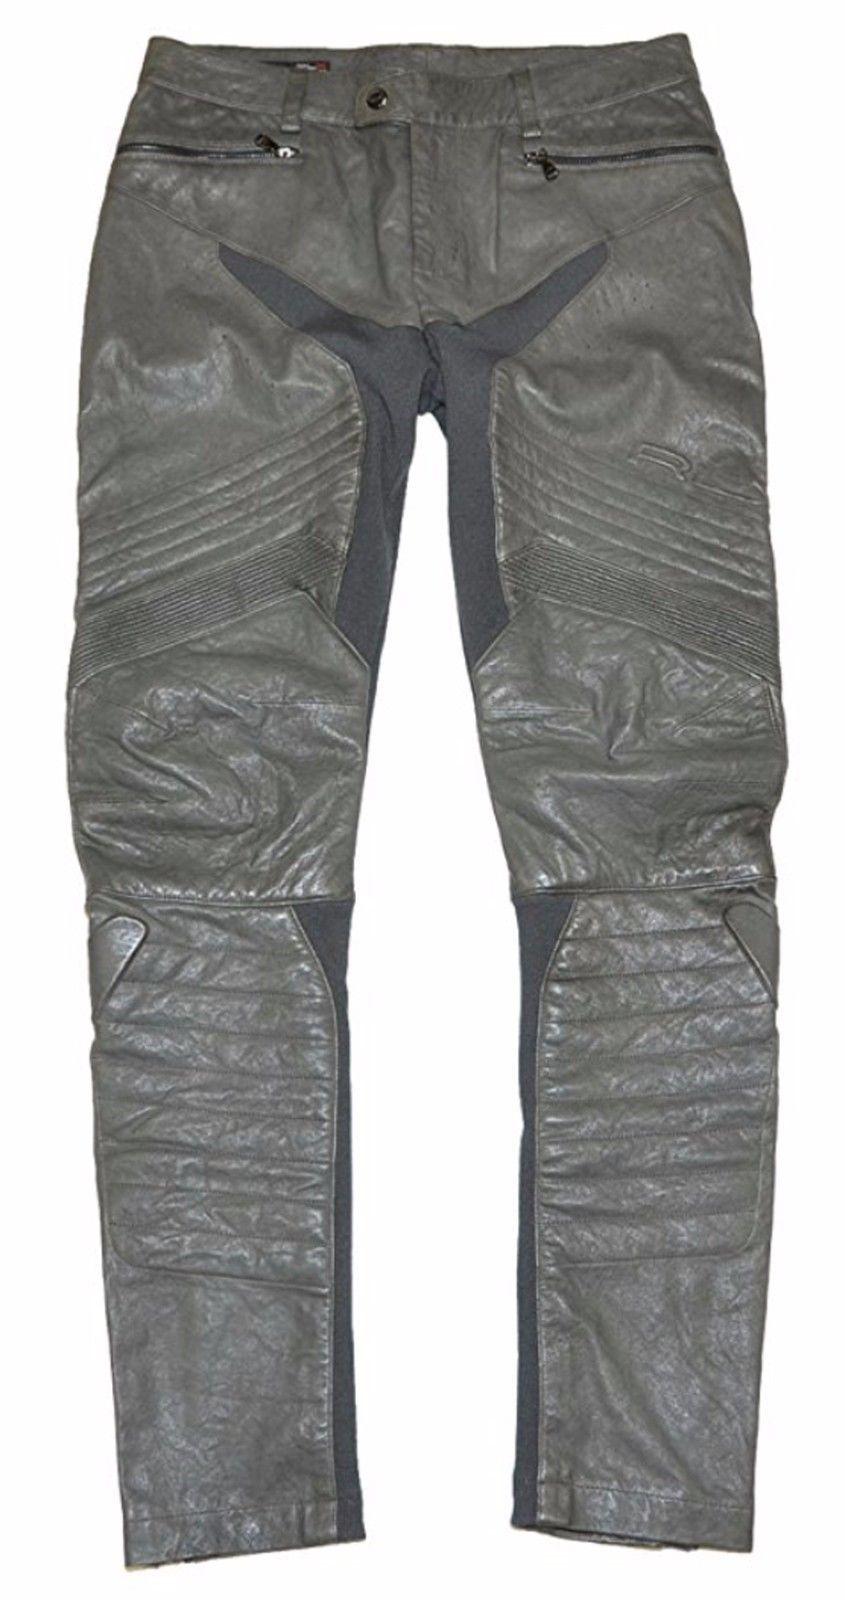 RLX by Ralph Lauren Women Leather Pants - Size S - Dark Grey